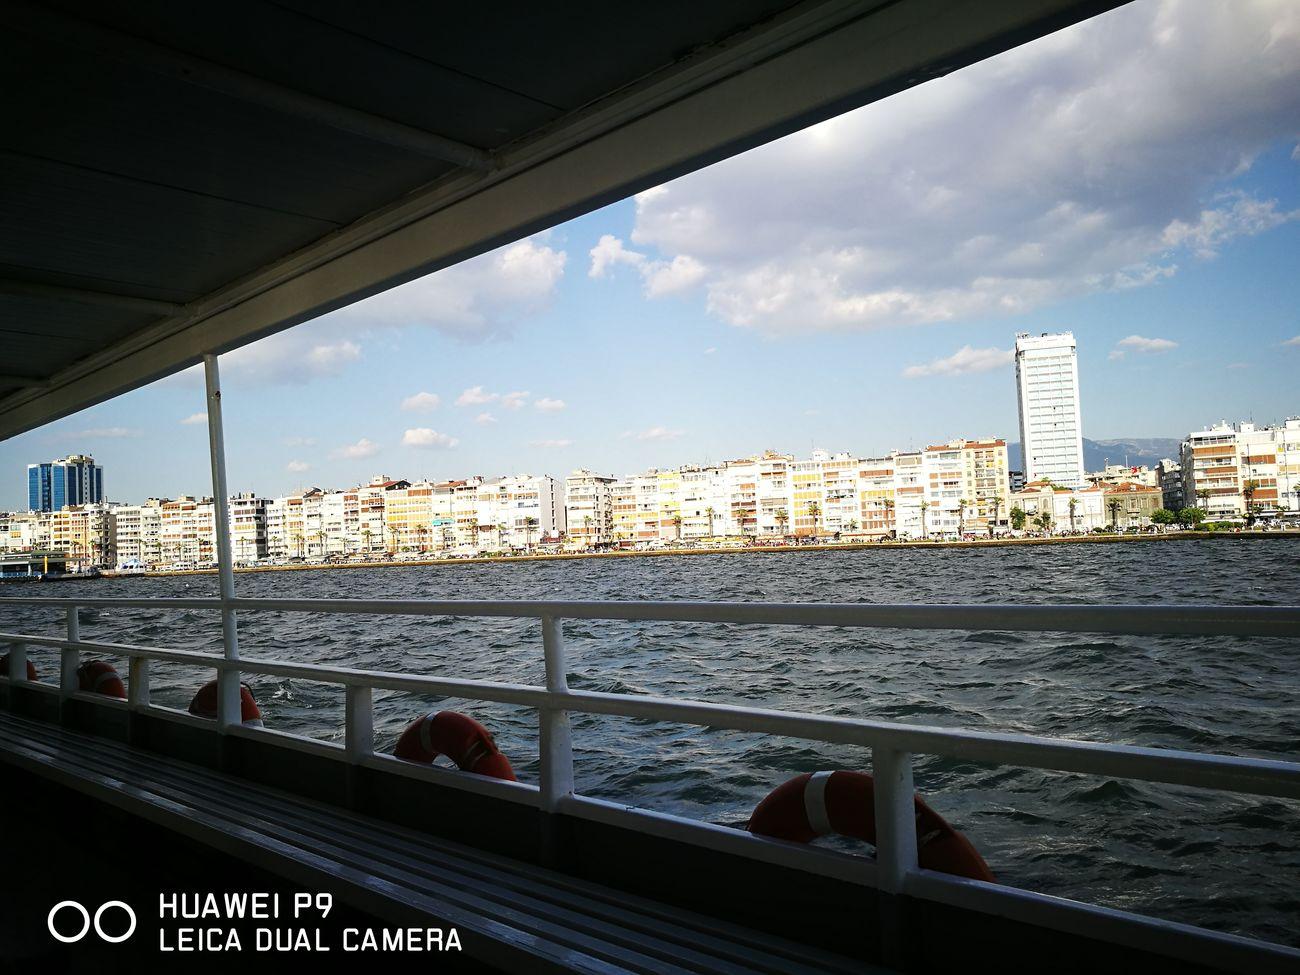 Cityscape Architecture Business Finance And Industry Travel Destinations Sunset Beautiful ♥ Ships⚓️⛵️🚢 Izmir ❤ Alsancak Kordon